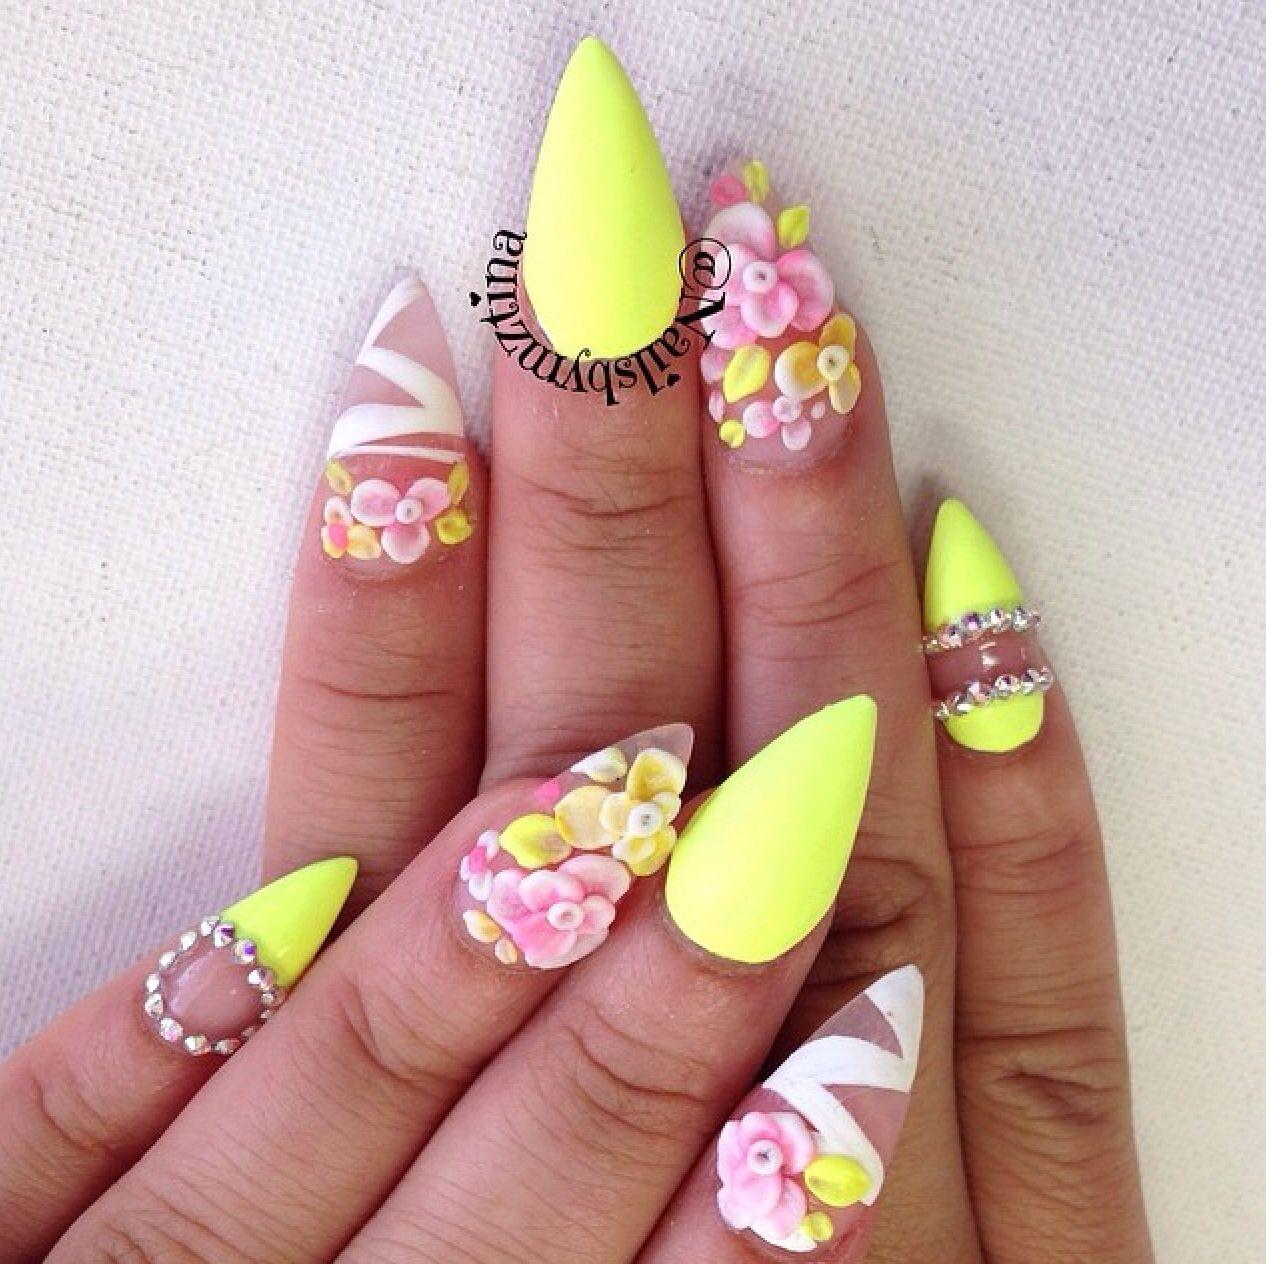 Spring gel nails from instagram | Gel nails | Pinterest | Nail nail ...